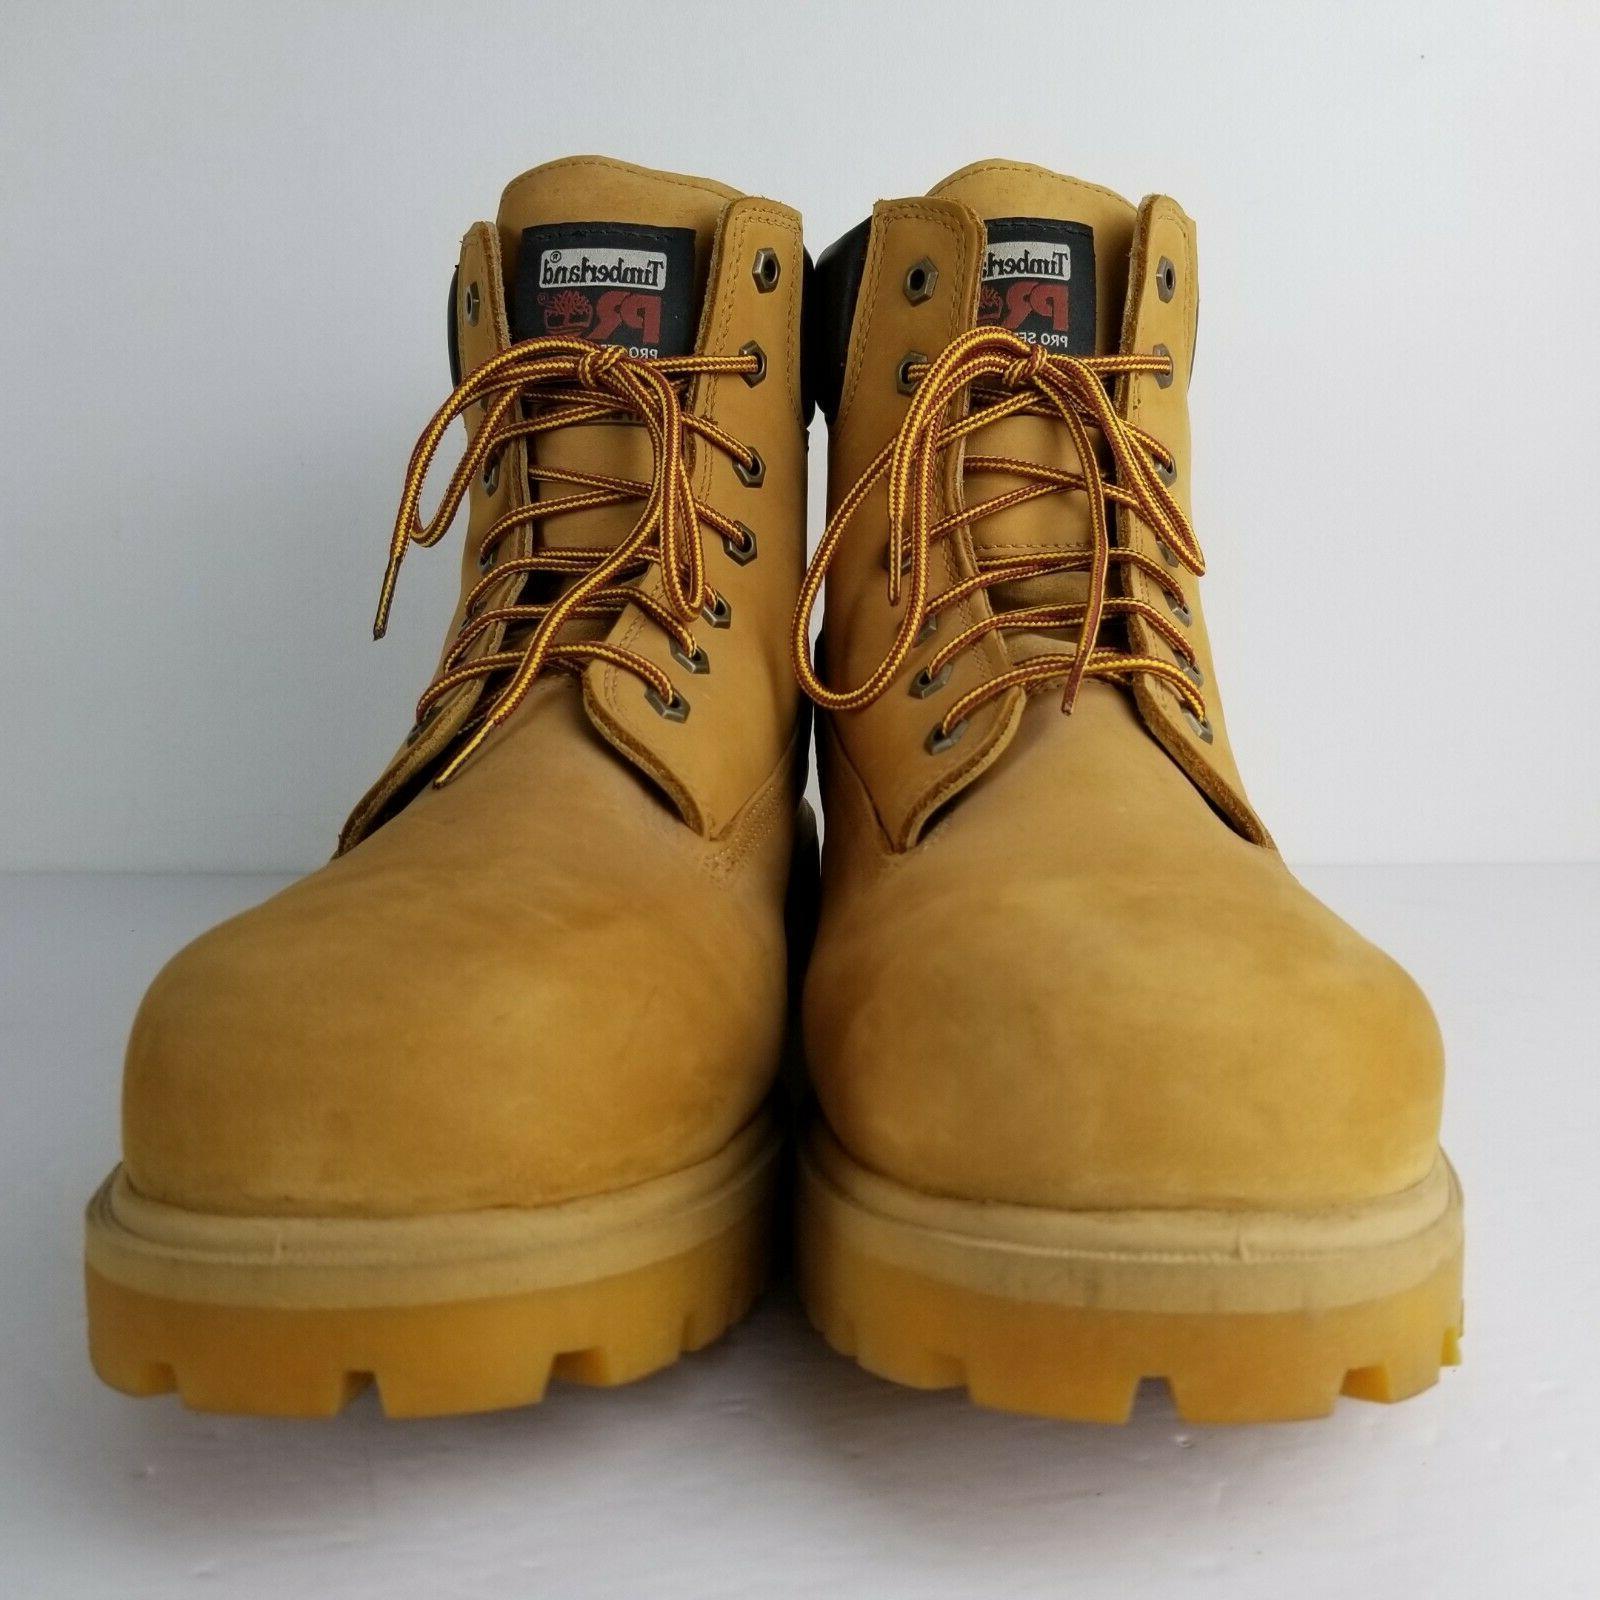 "TIMBERLAND PRO Attach 6"" Soft Waterproof Wheat Work Boots 15 M"